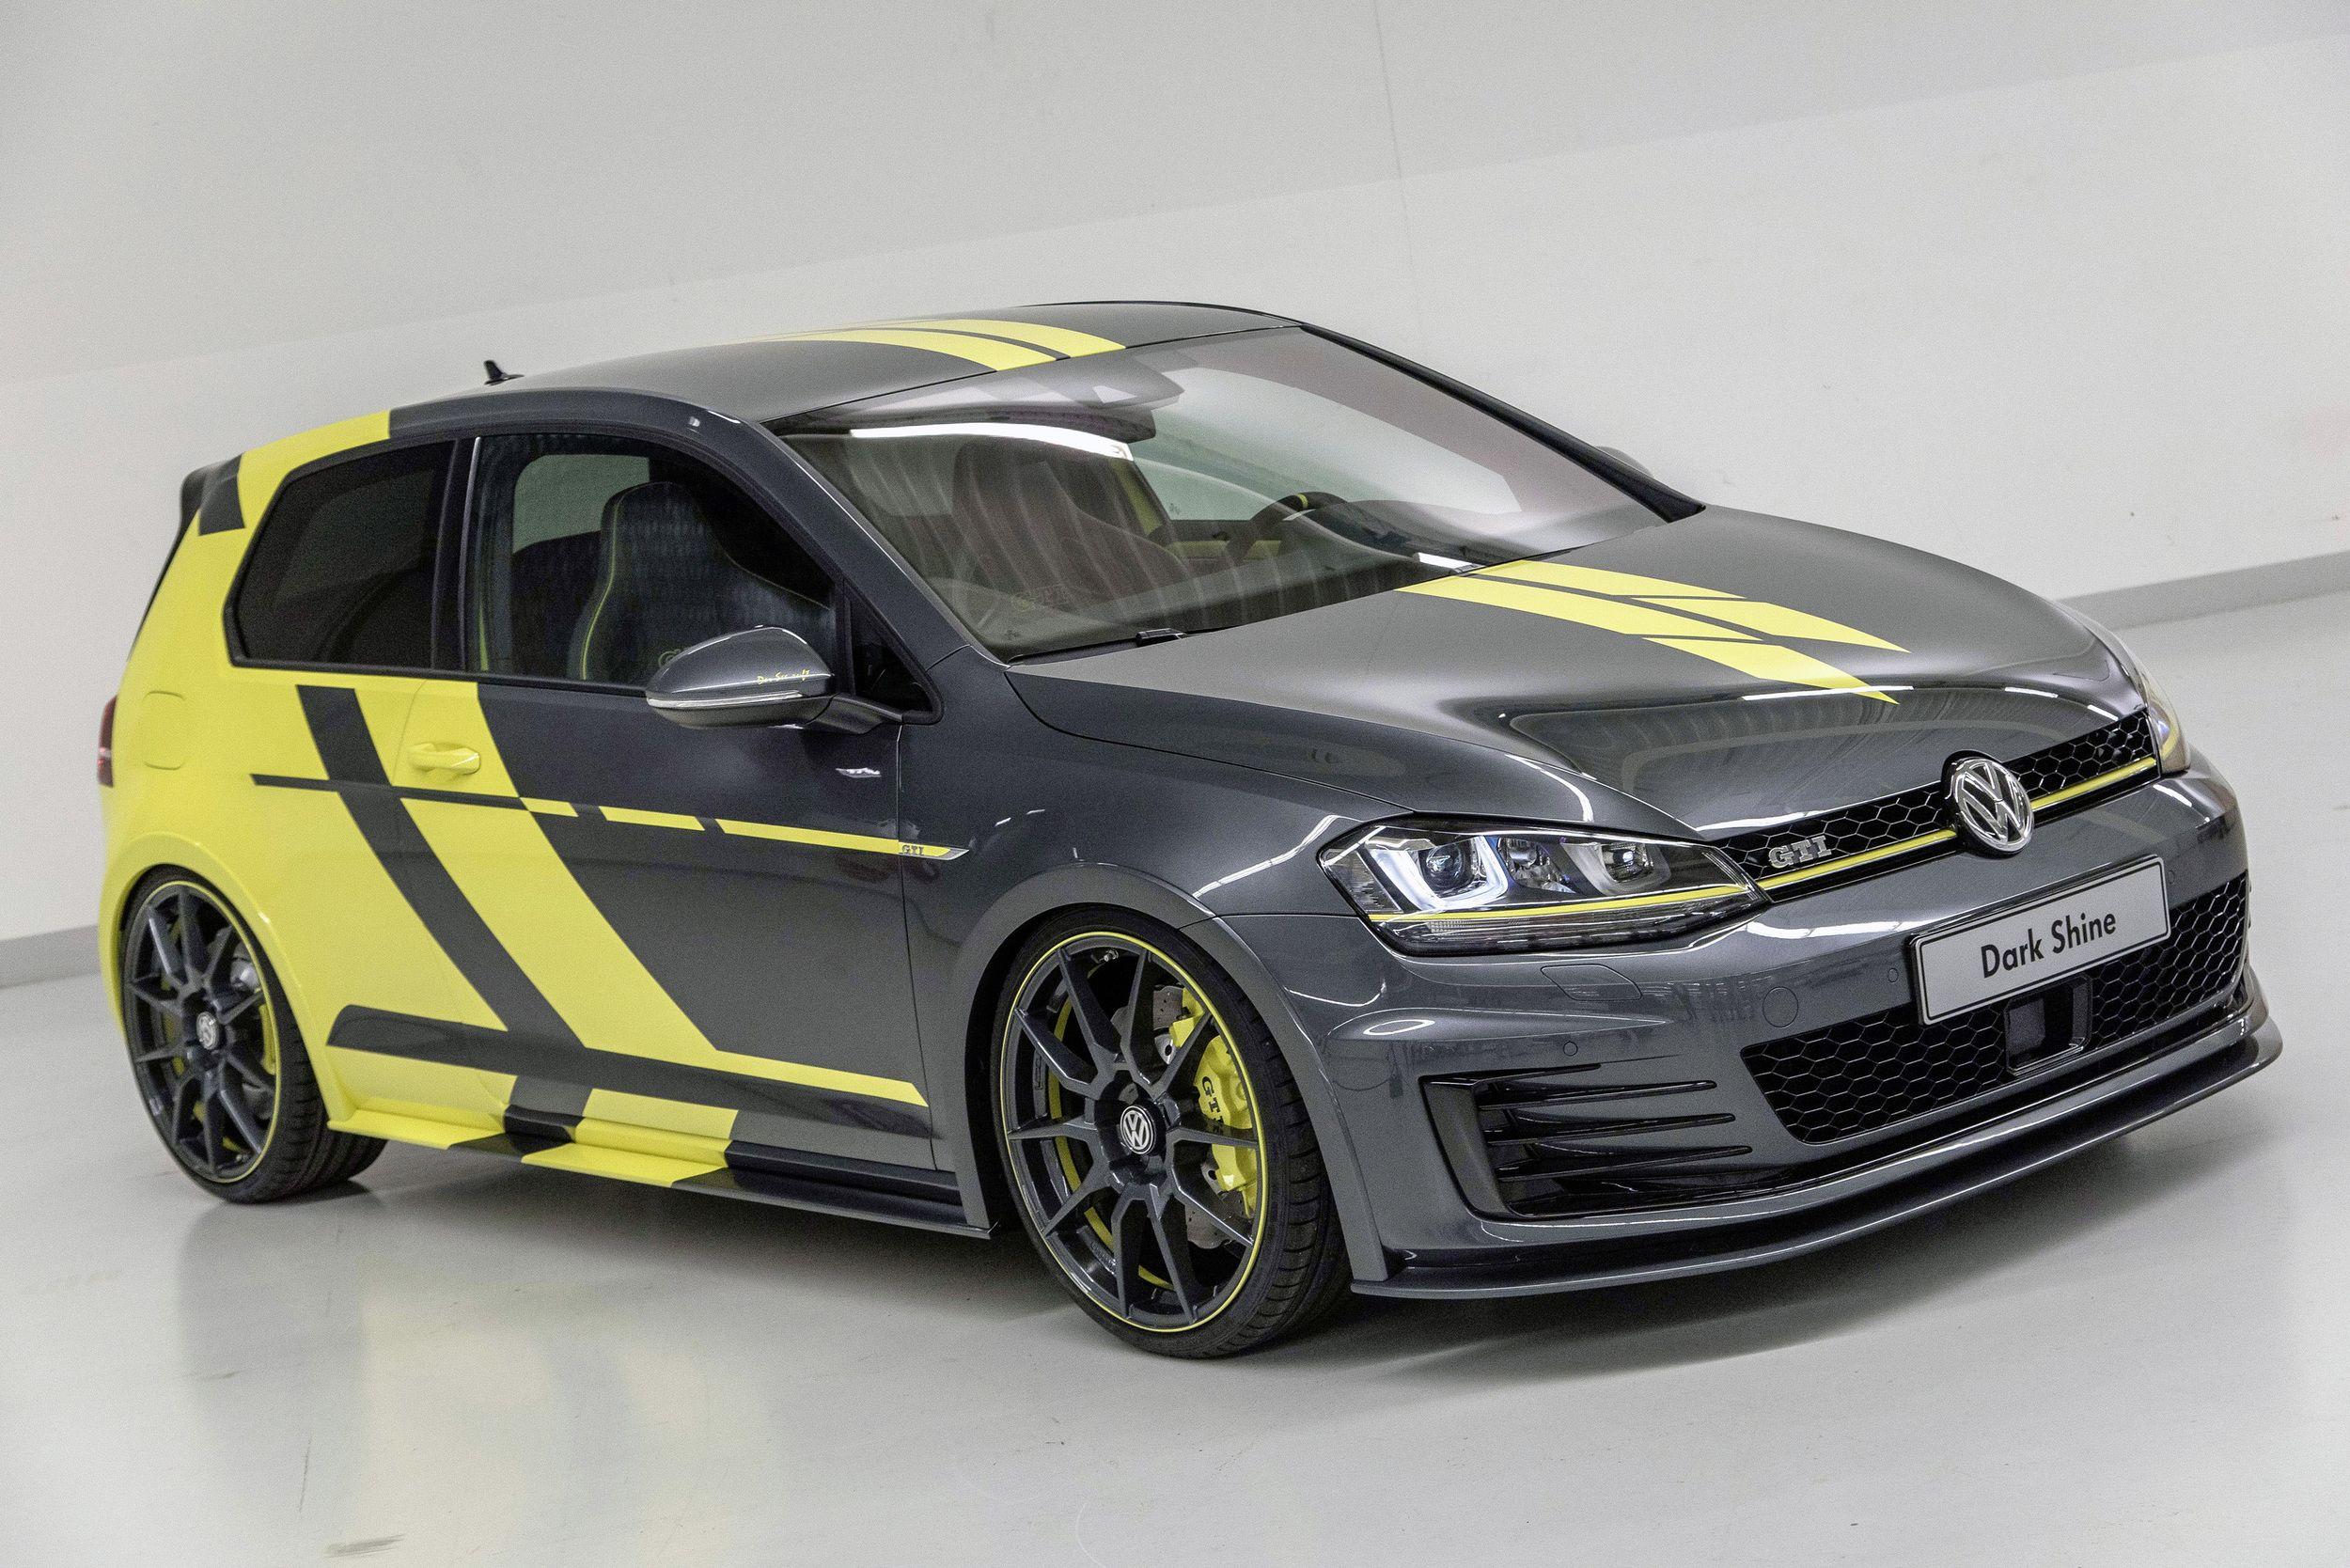 Top car vw apprentices prep golf gti dark shine variant biturbo for worthersee